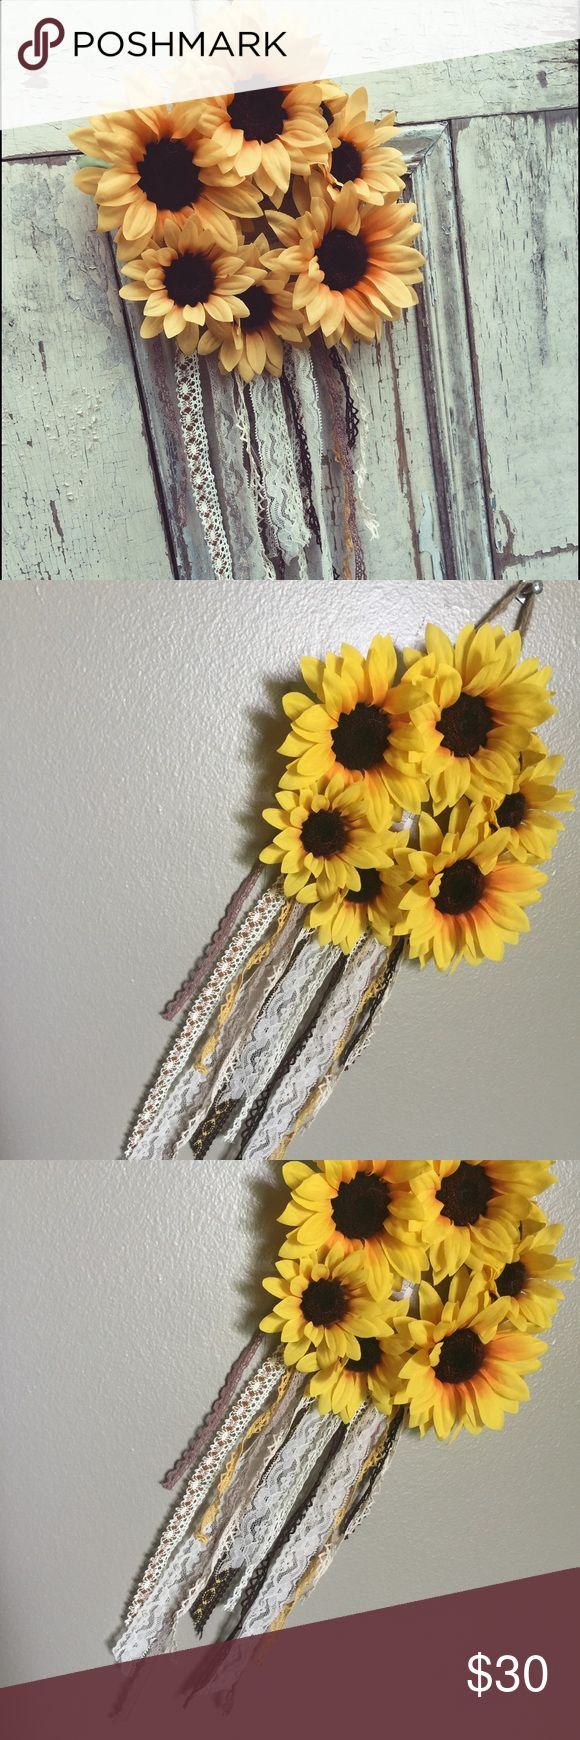 17 Best Ideas About Sunflower Crafts On Pinterest